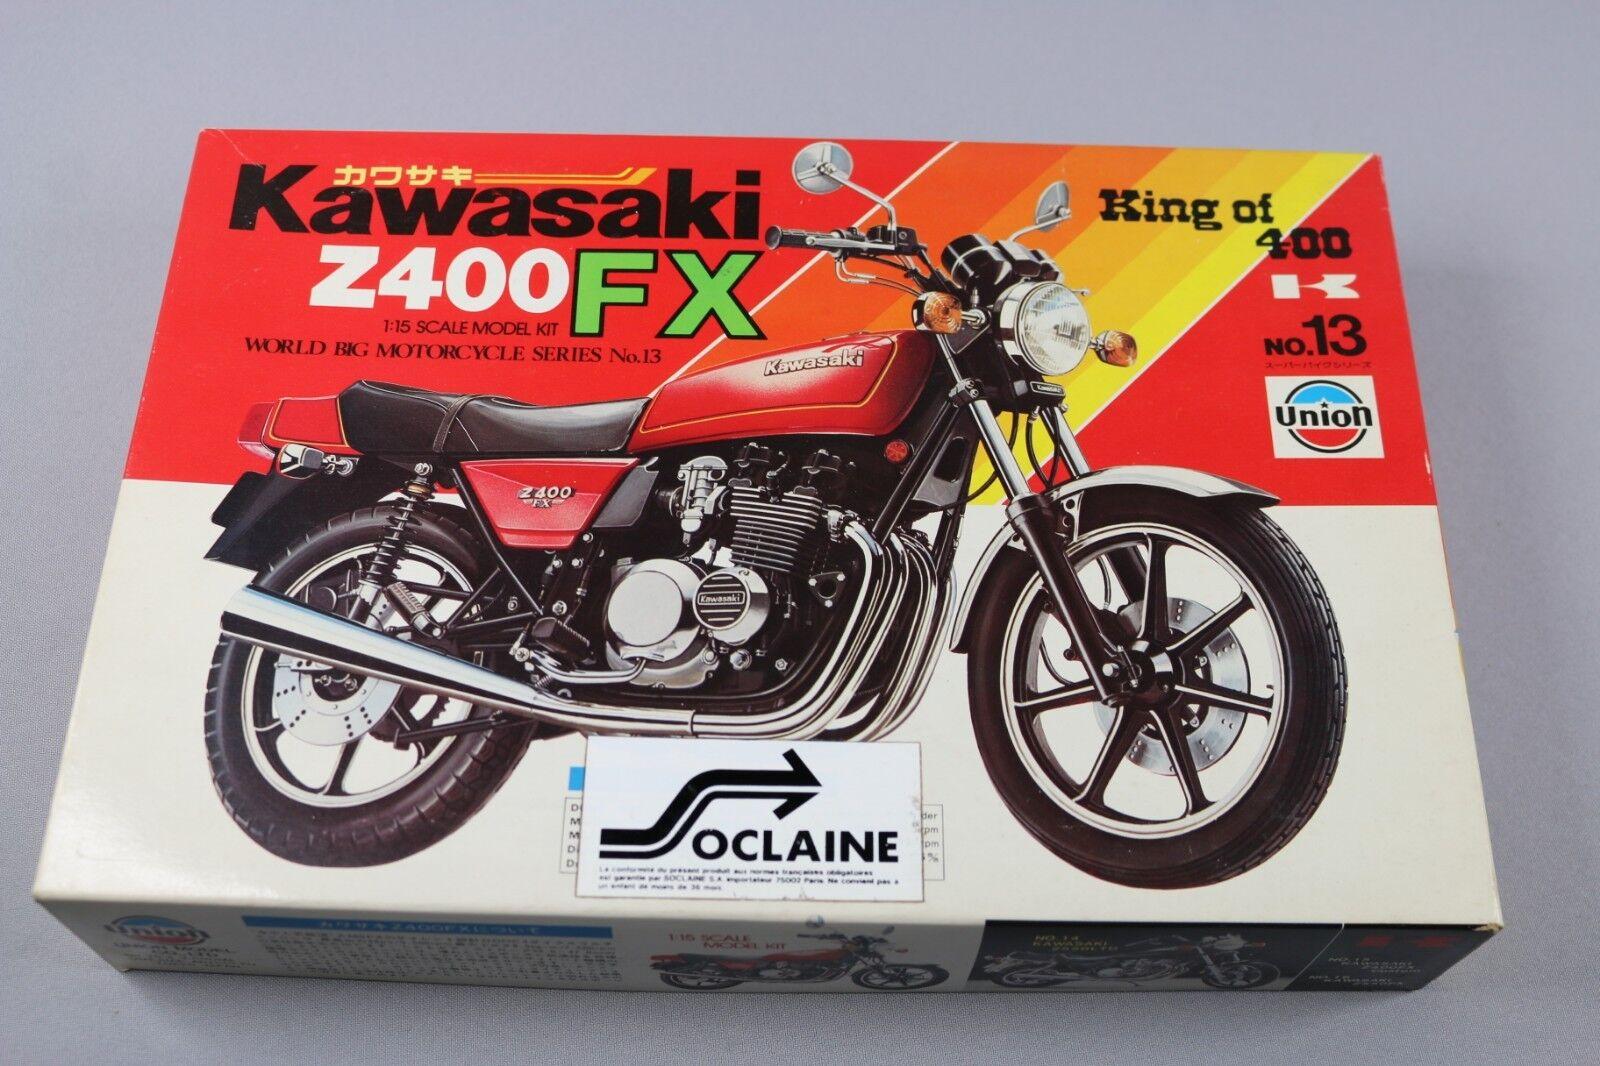 Zf1011 union 1 15 model m-13 700 kawasaki z400fx world series Big motorcycles